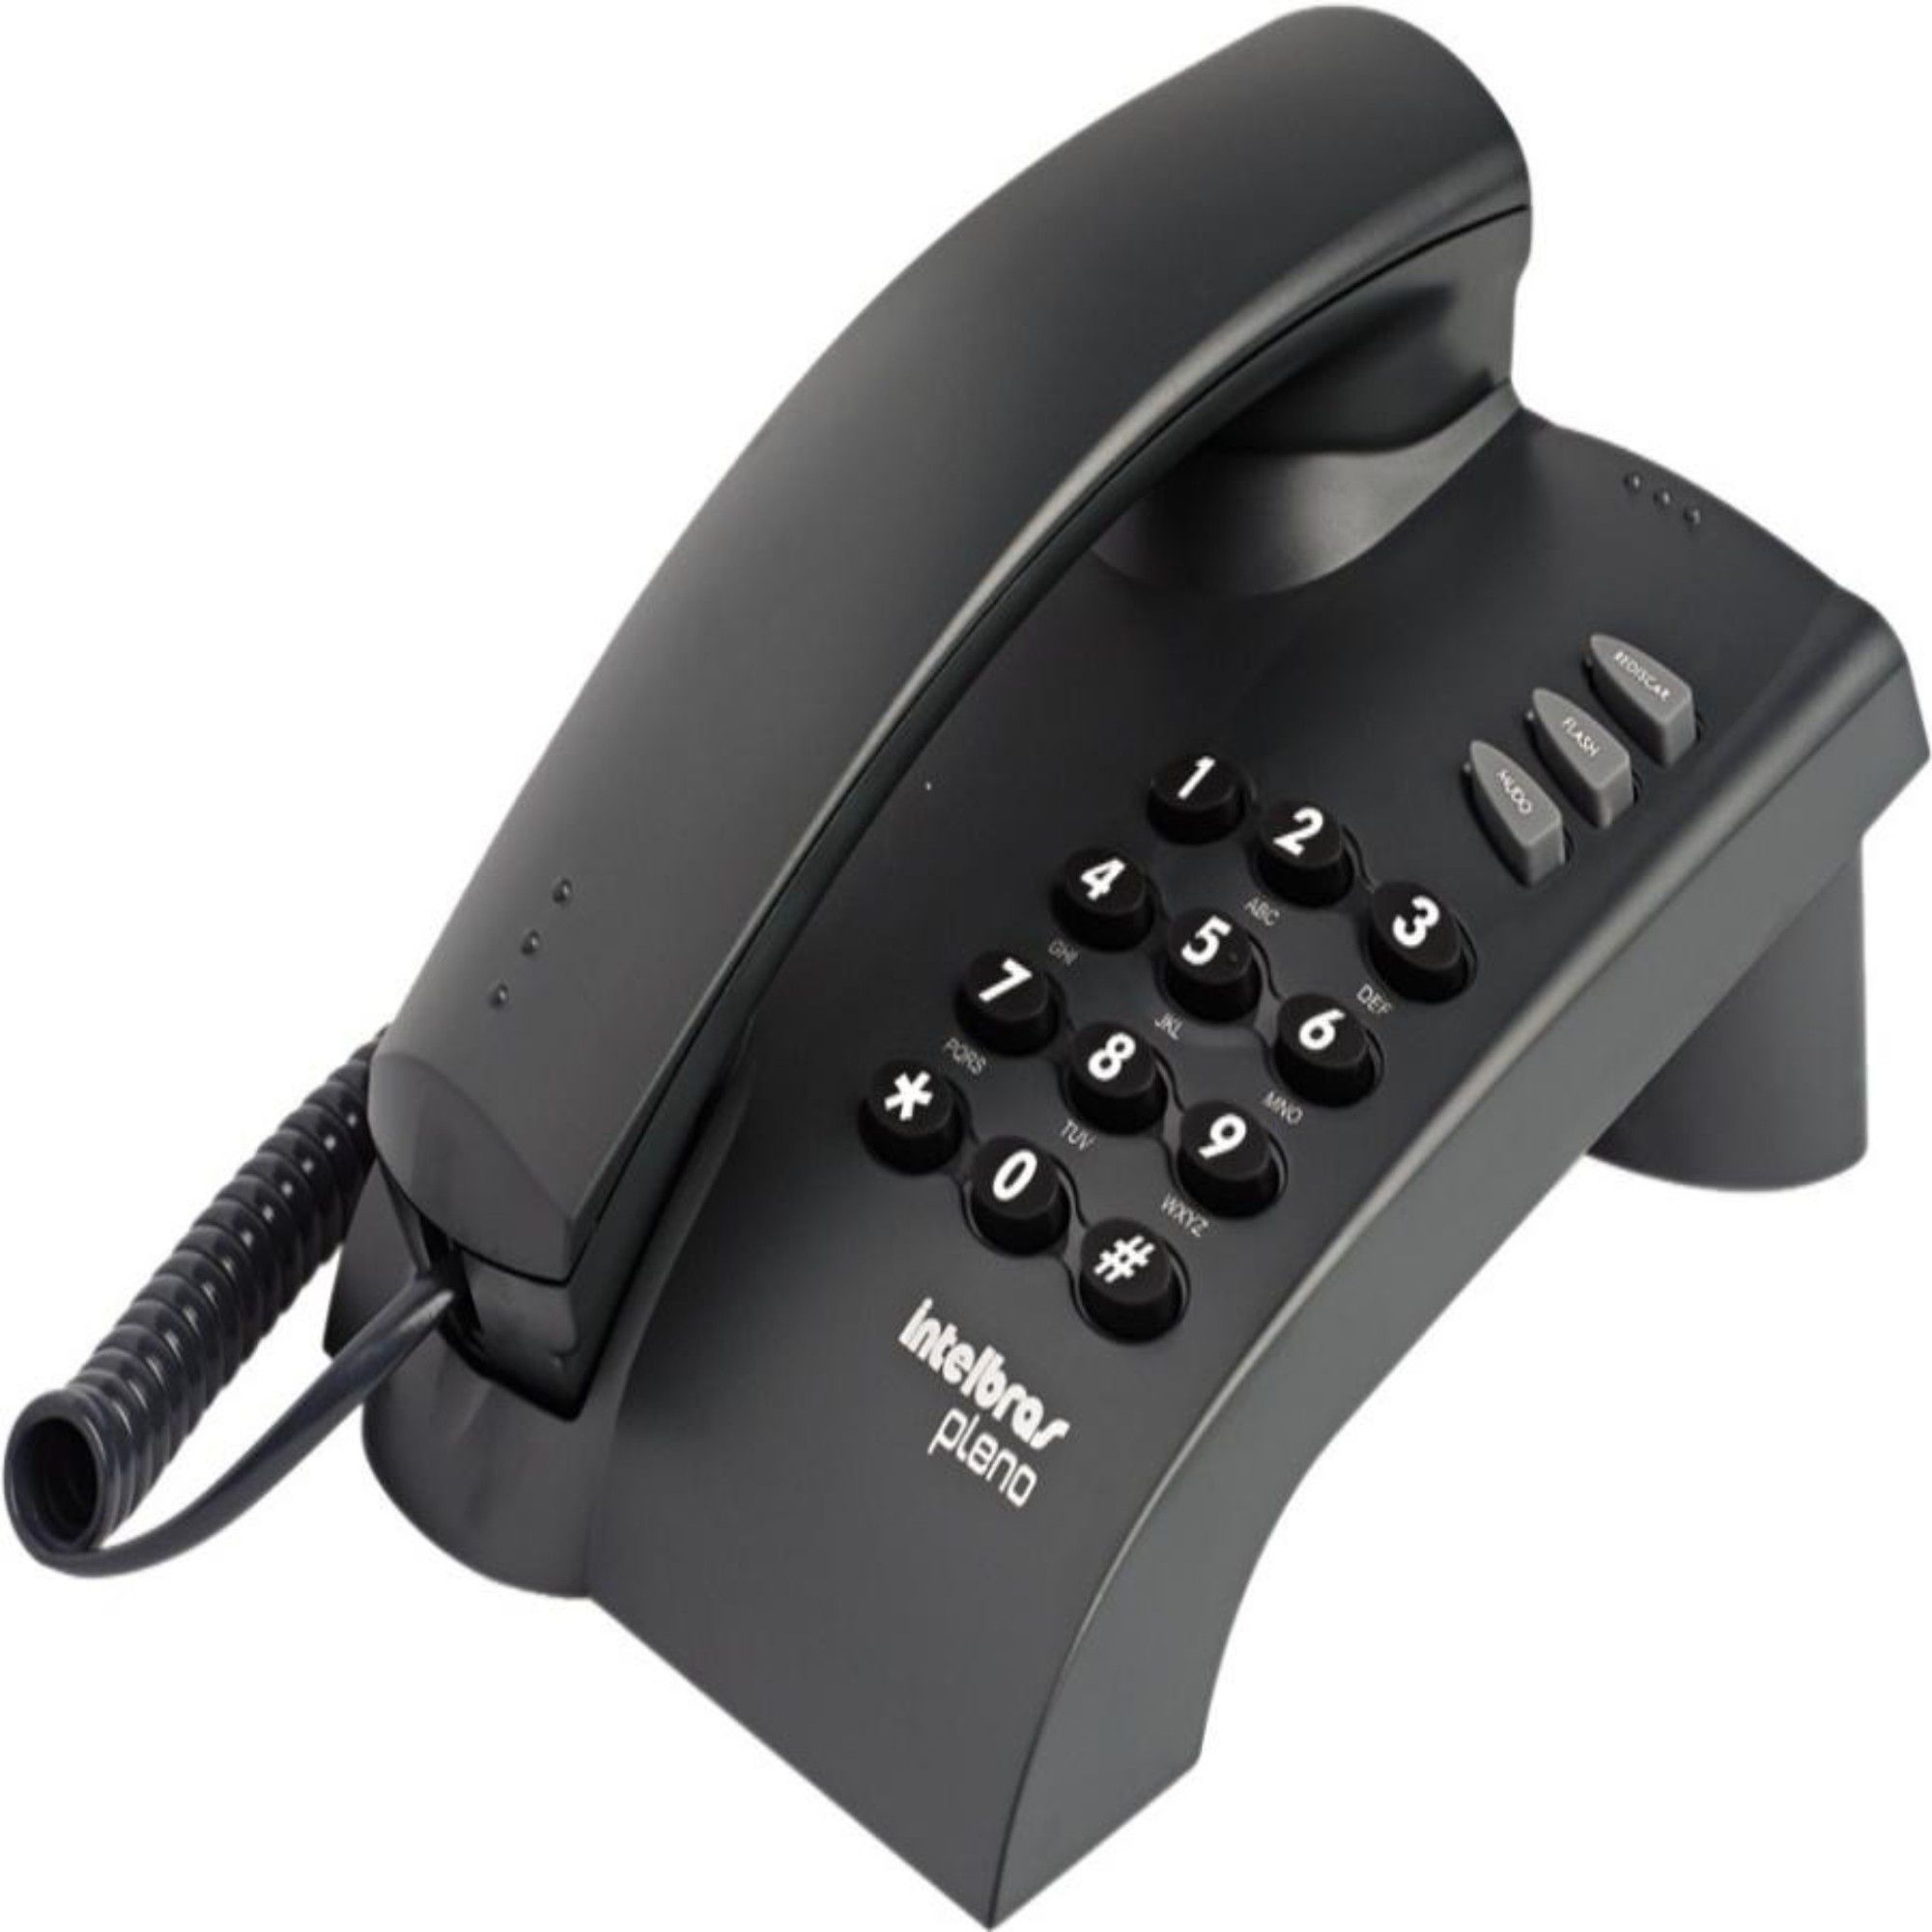 Aparelho Telefônico Fixo C/ Fio Intelbras Pleno Preto